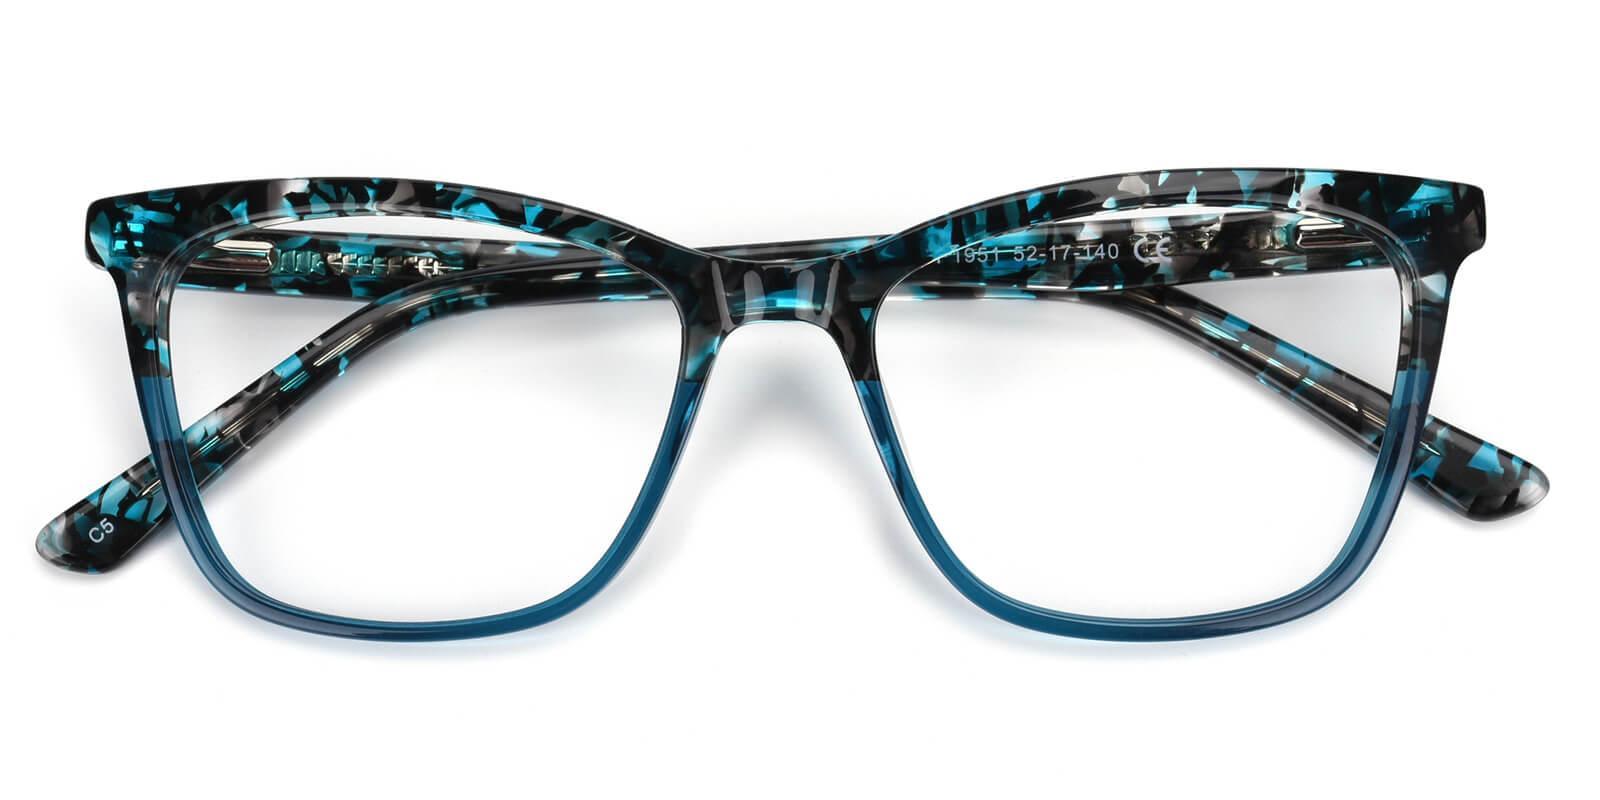 Beatrice-Blue-Cat-Acetate-Eyeglasses-detail